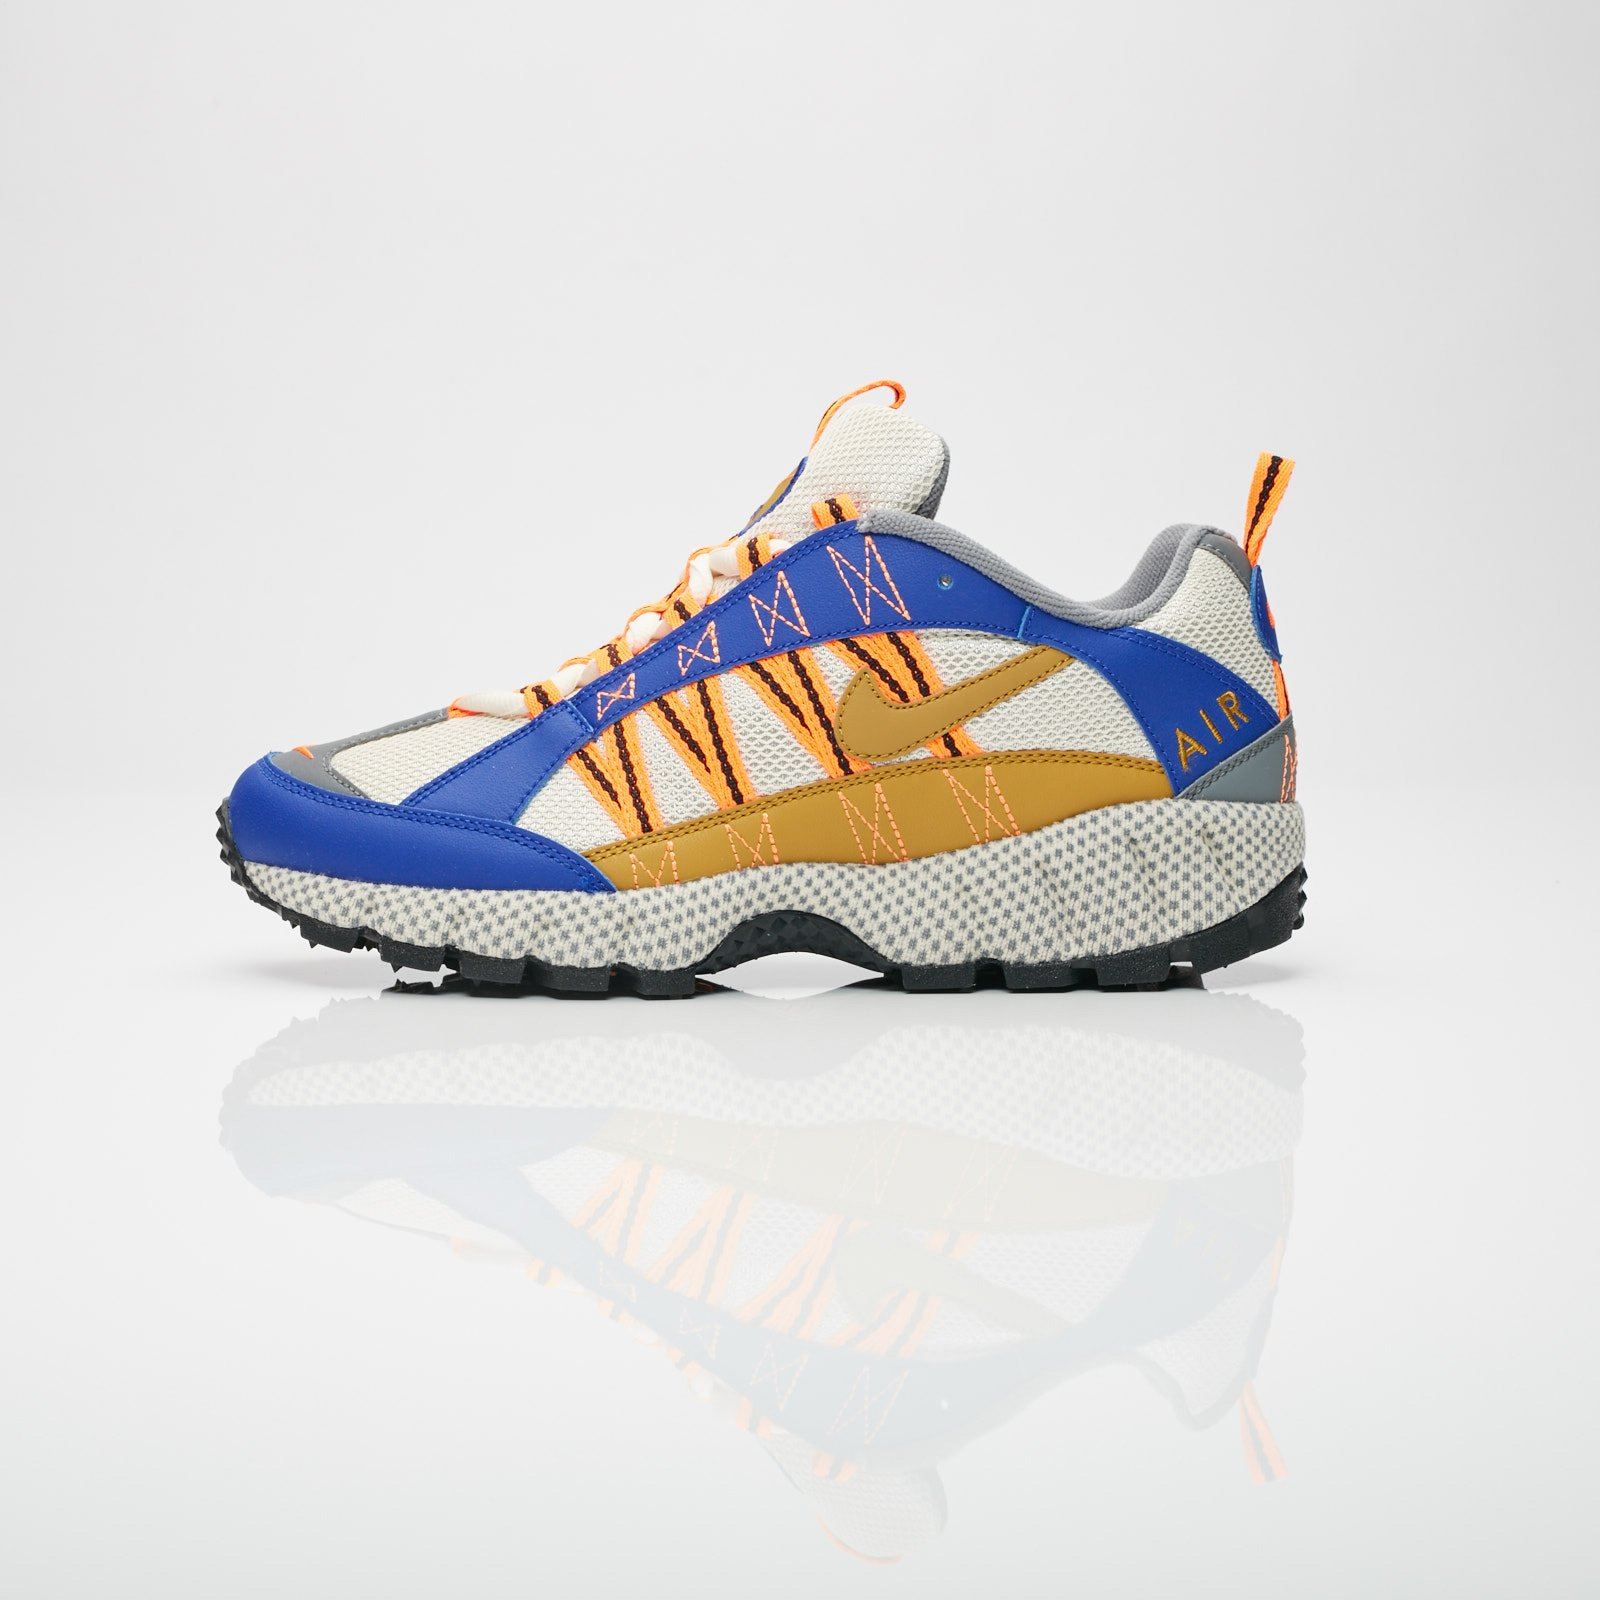 super popular fe131 389cd Nike Air Humara 17 QS - Ao3297-400 - Sneakersnstuff   sneakers   streetwear  online since 1999